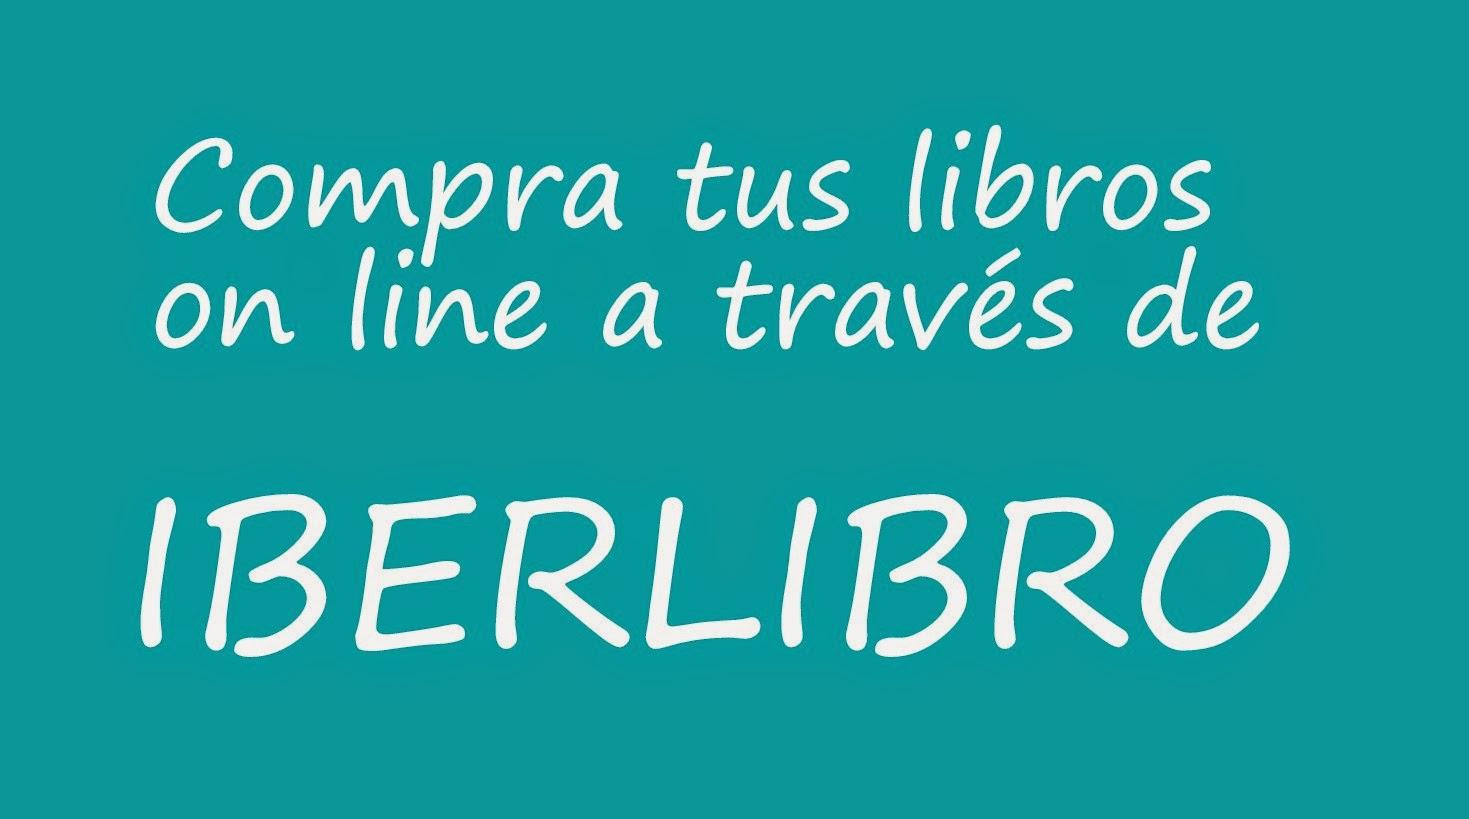 Tus libros on line